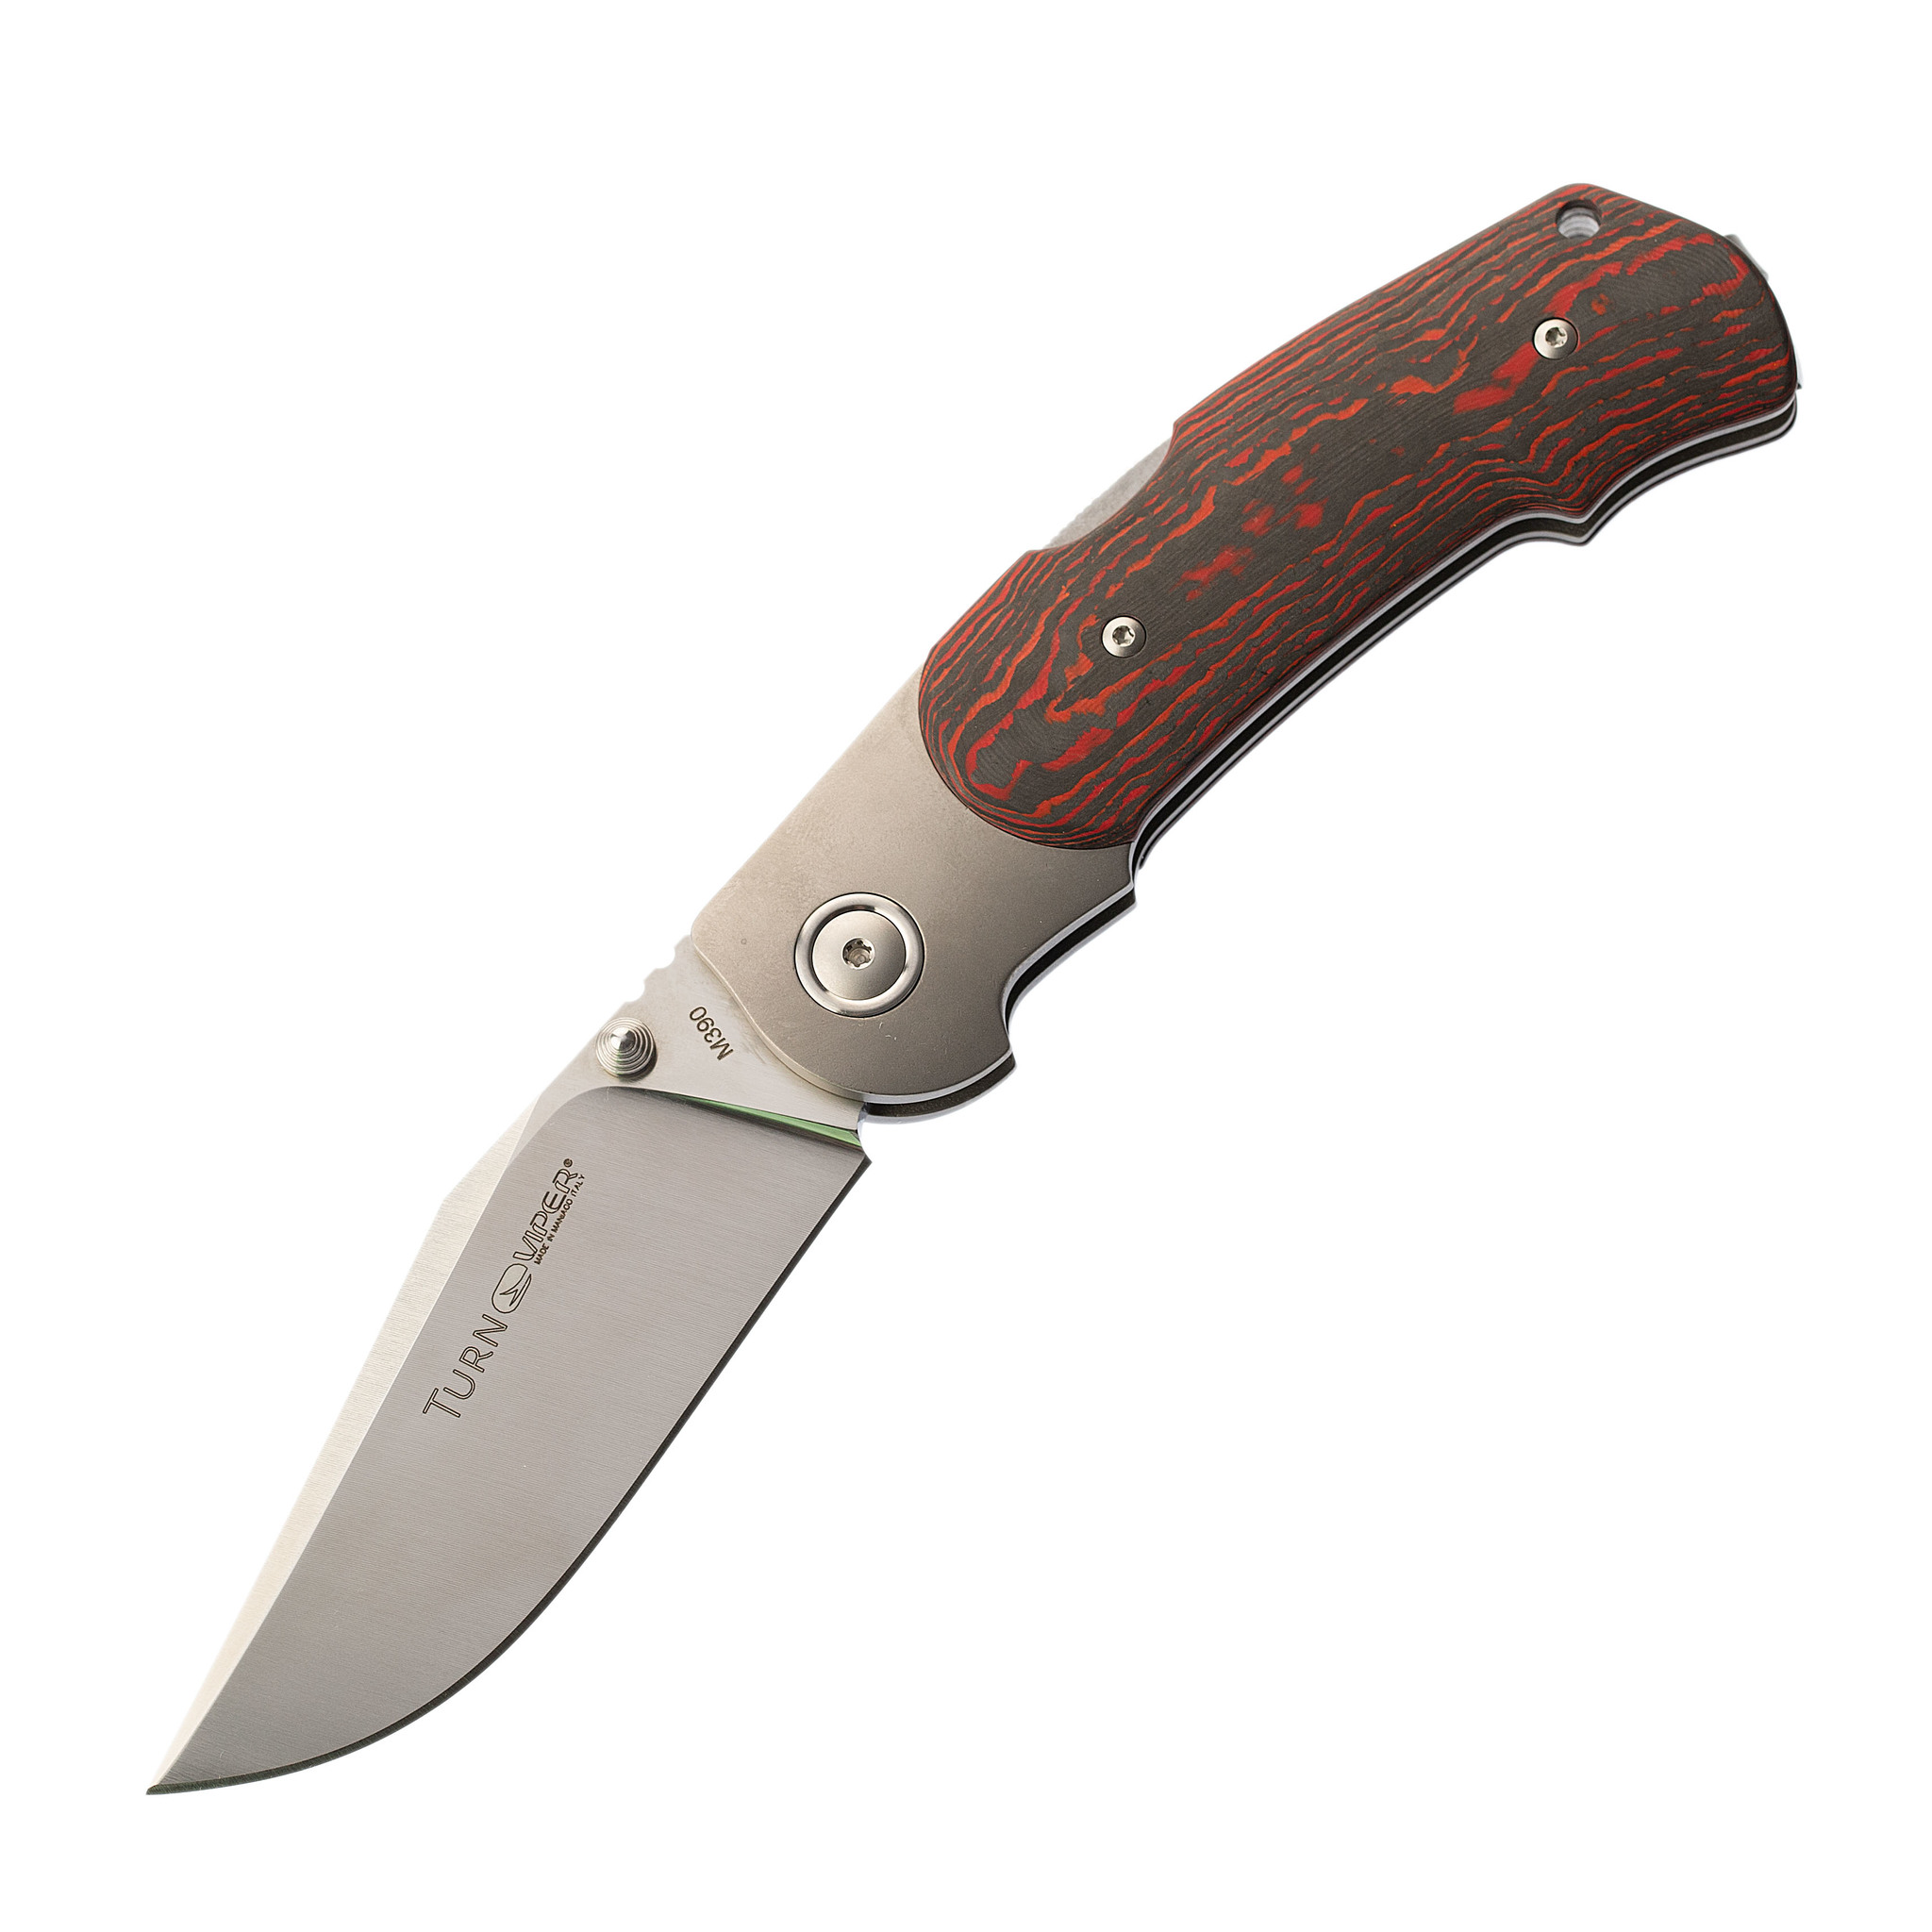 Складной нож Viper Turn, сталь M390 Satin, Red Lava Carbon Fiber